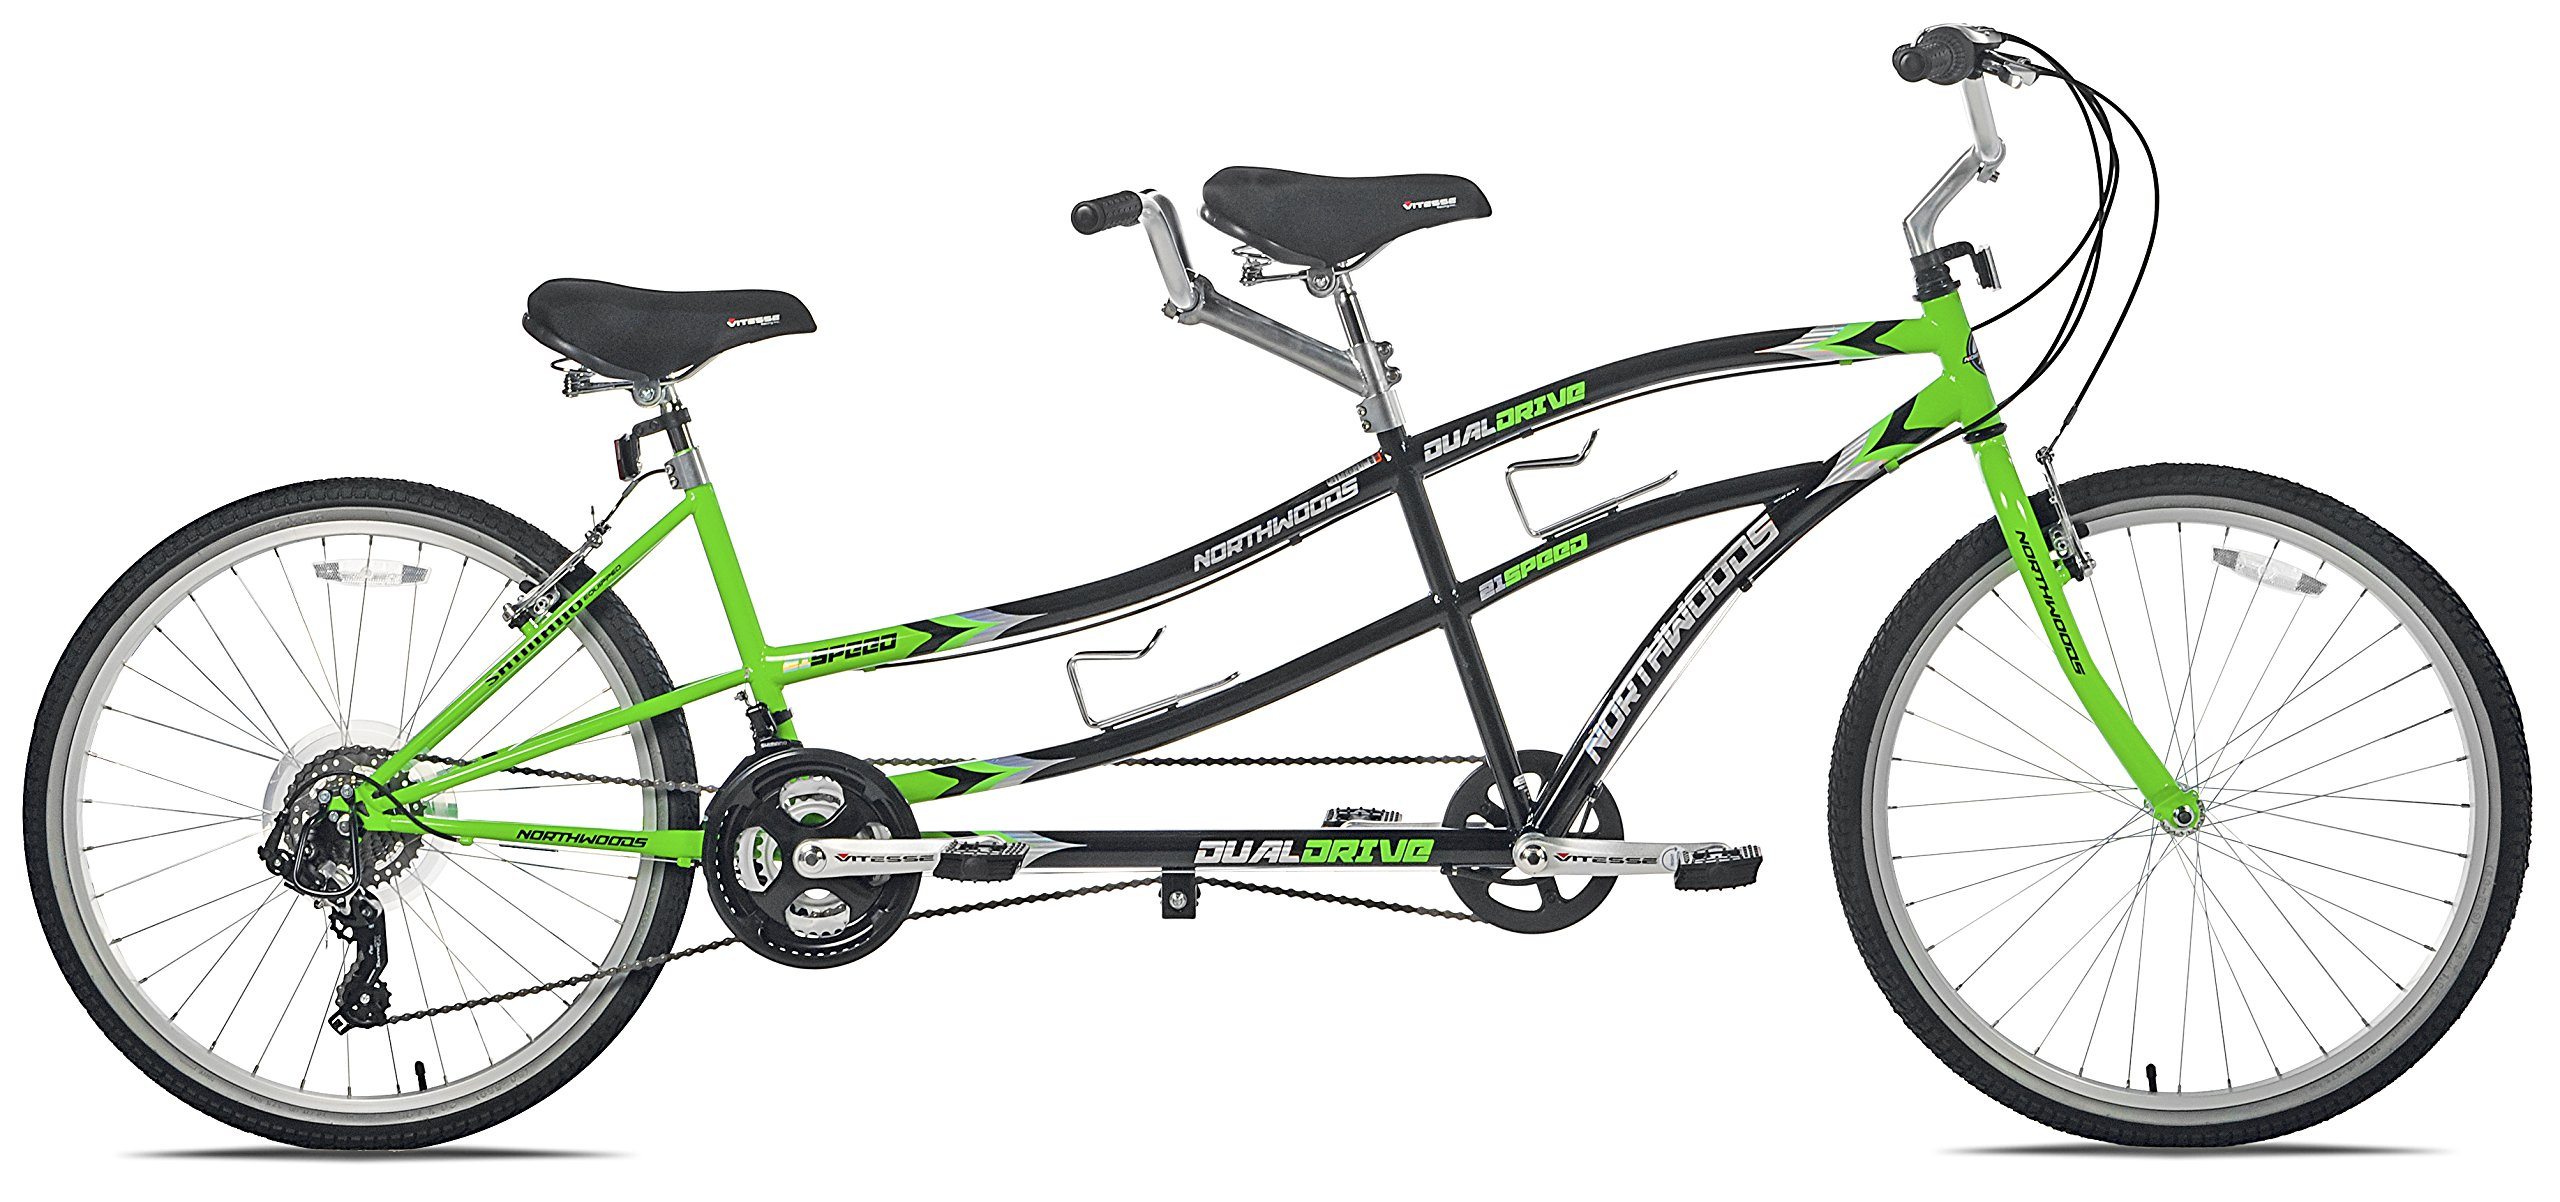 Kent Northwoods Dual Drive Tandem Bike by Kent (Image #2)